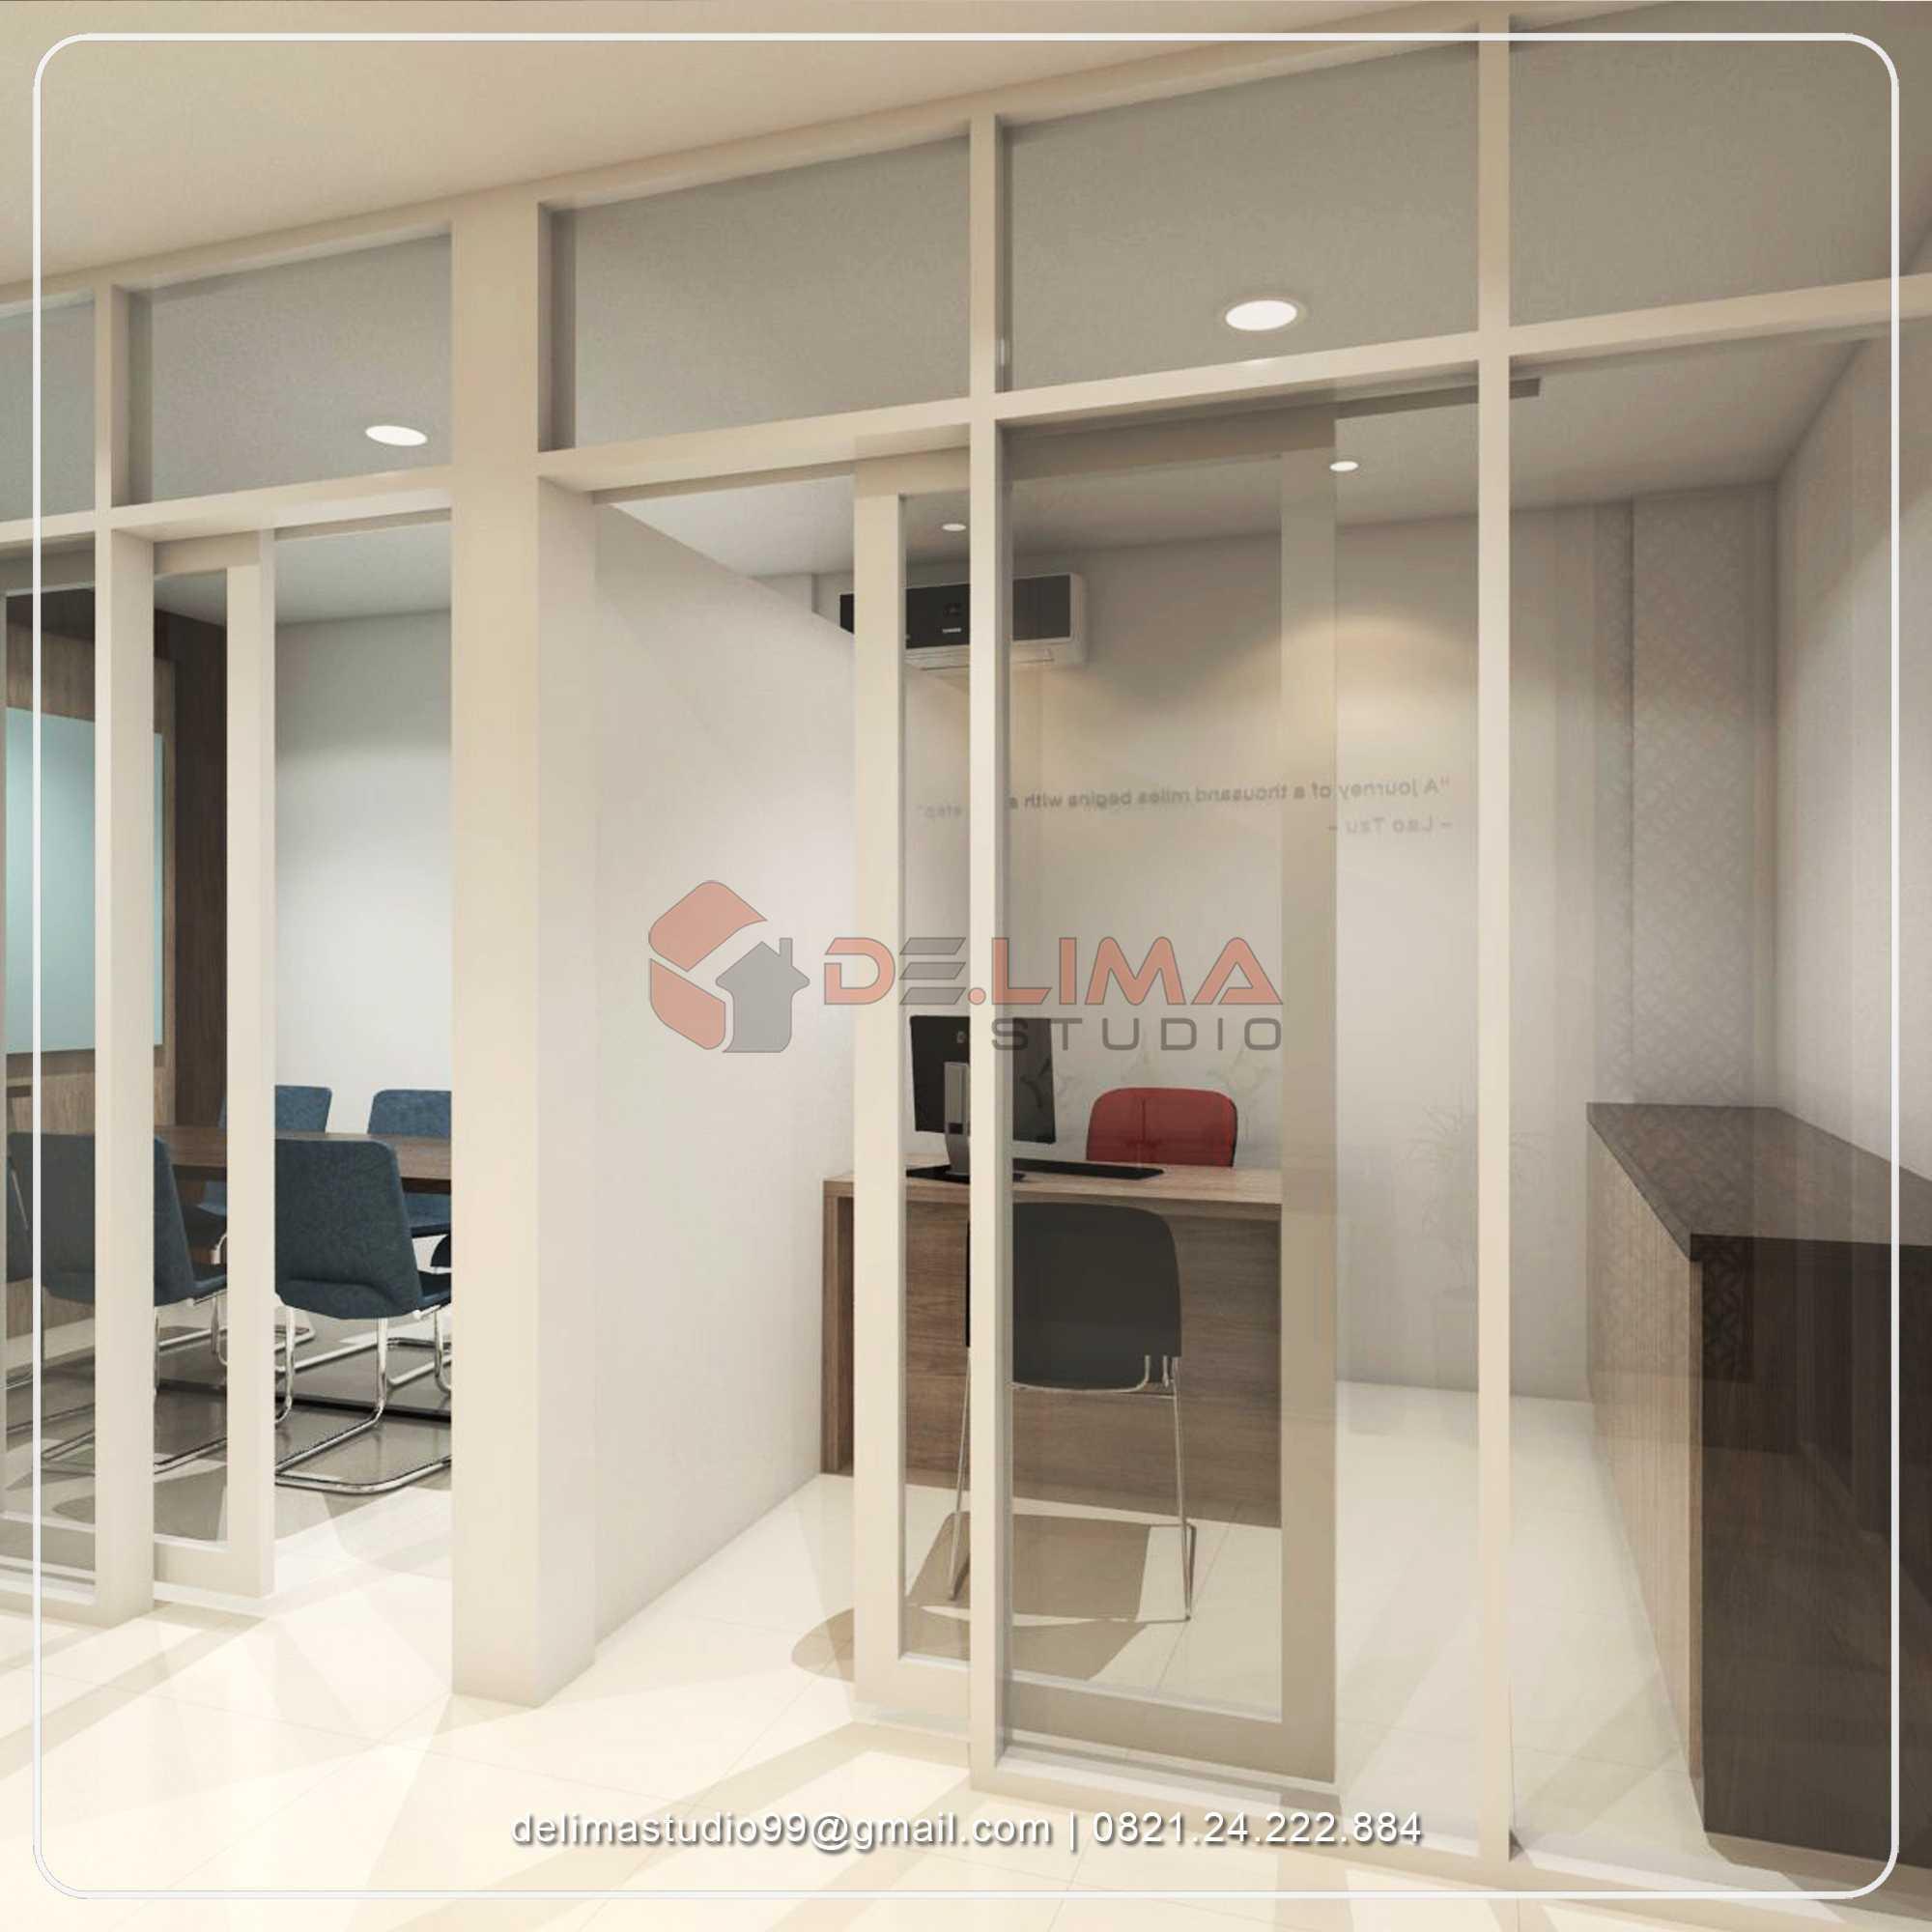 Delima Studio Office At Cikarang Sukamahi, Kec. Cikarang Pusat, Bekasi, Jawa Barat 17530, Indonesia Sukamahi, Kec. Cikarang Pusat, Bekasi, Jawa Barat 17530, Indonesia Delima-Studio-Office-At-Cikarang Modern  77710